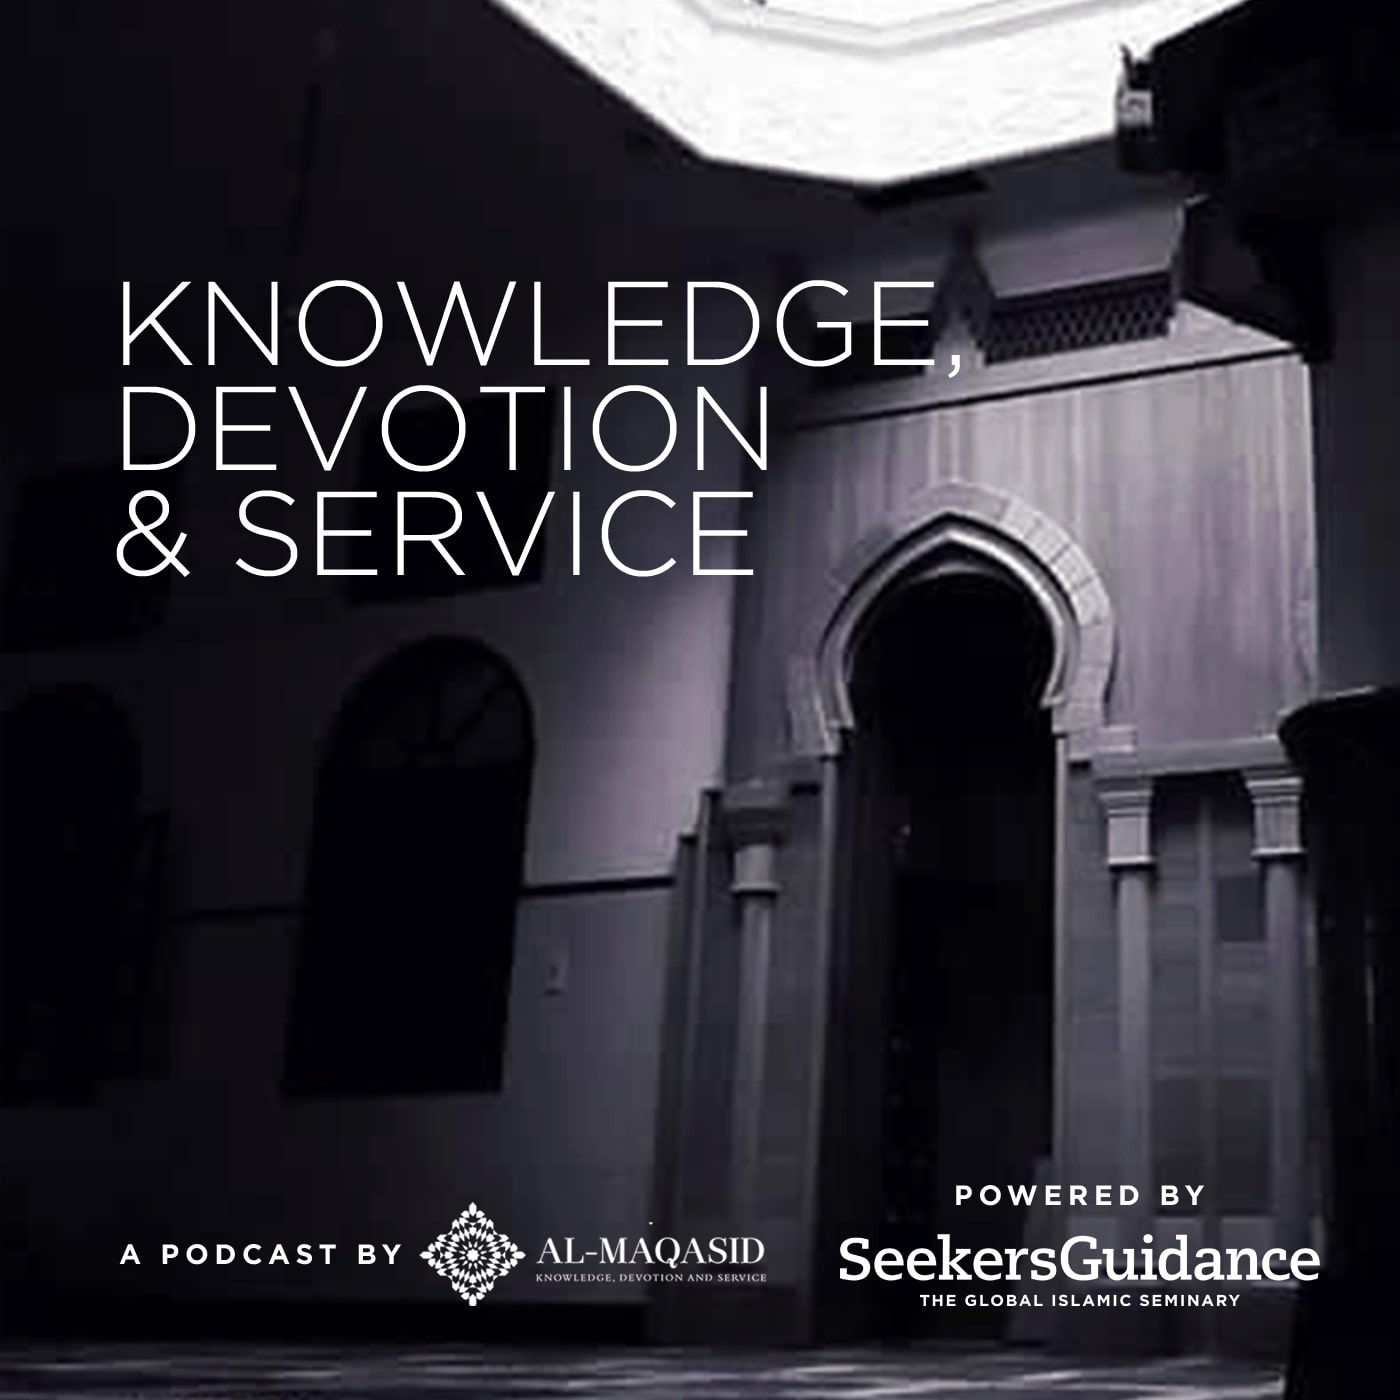 Knowledge, Devotion & Service